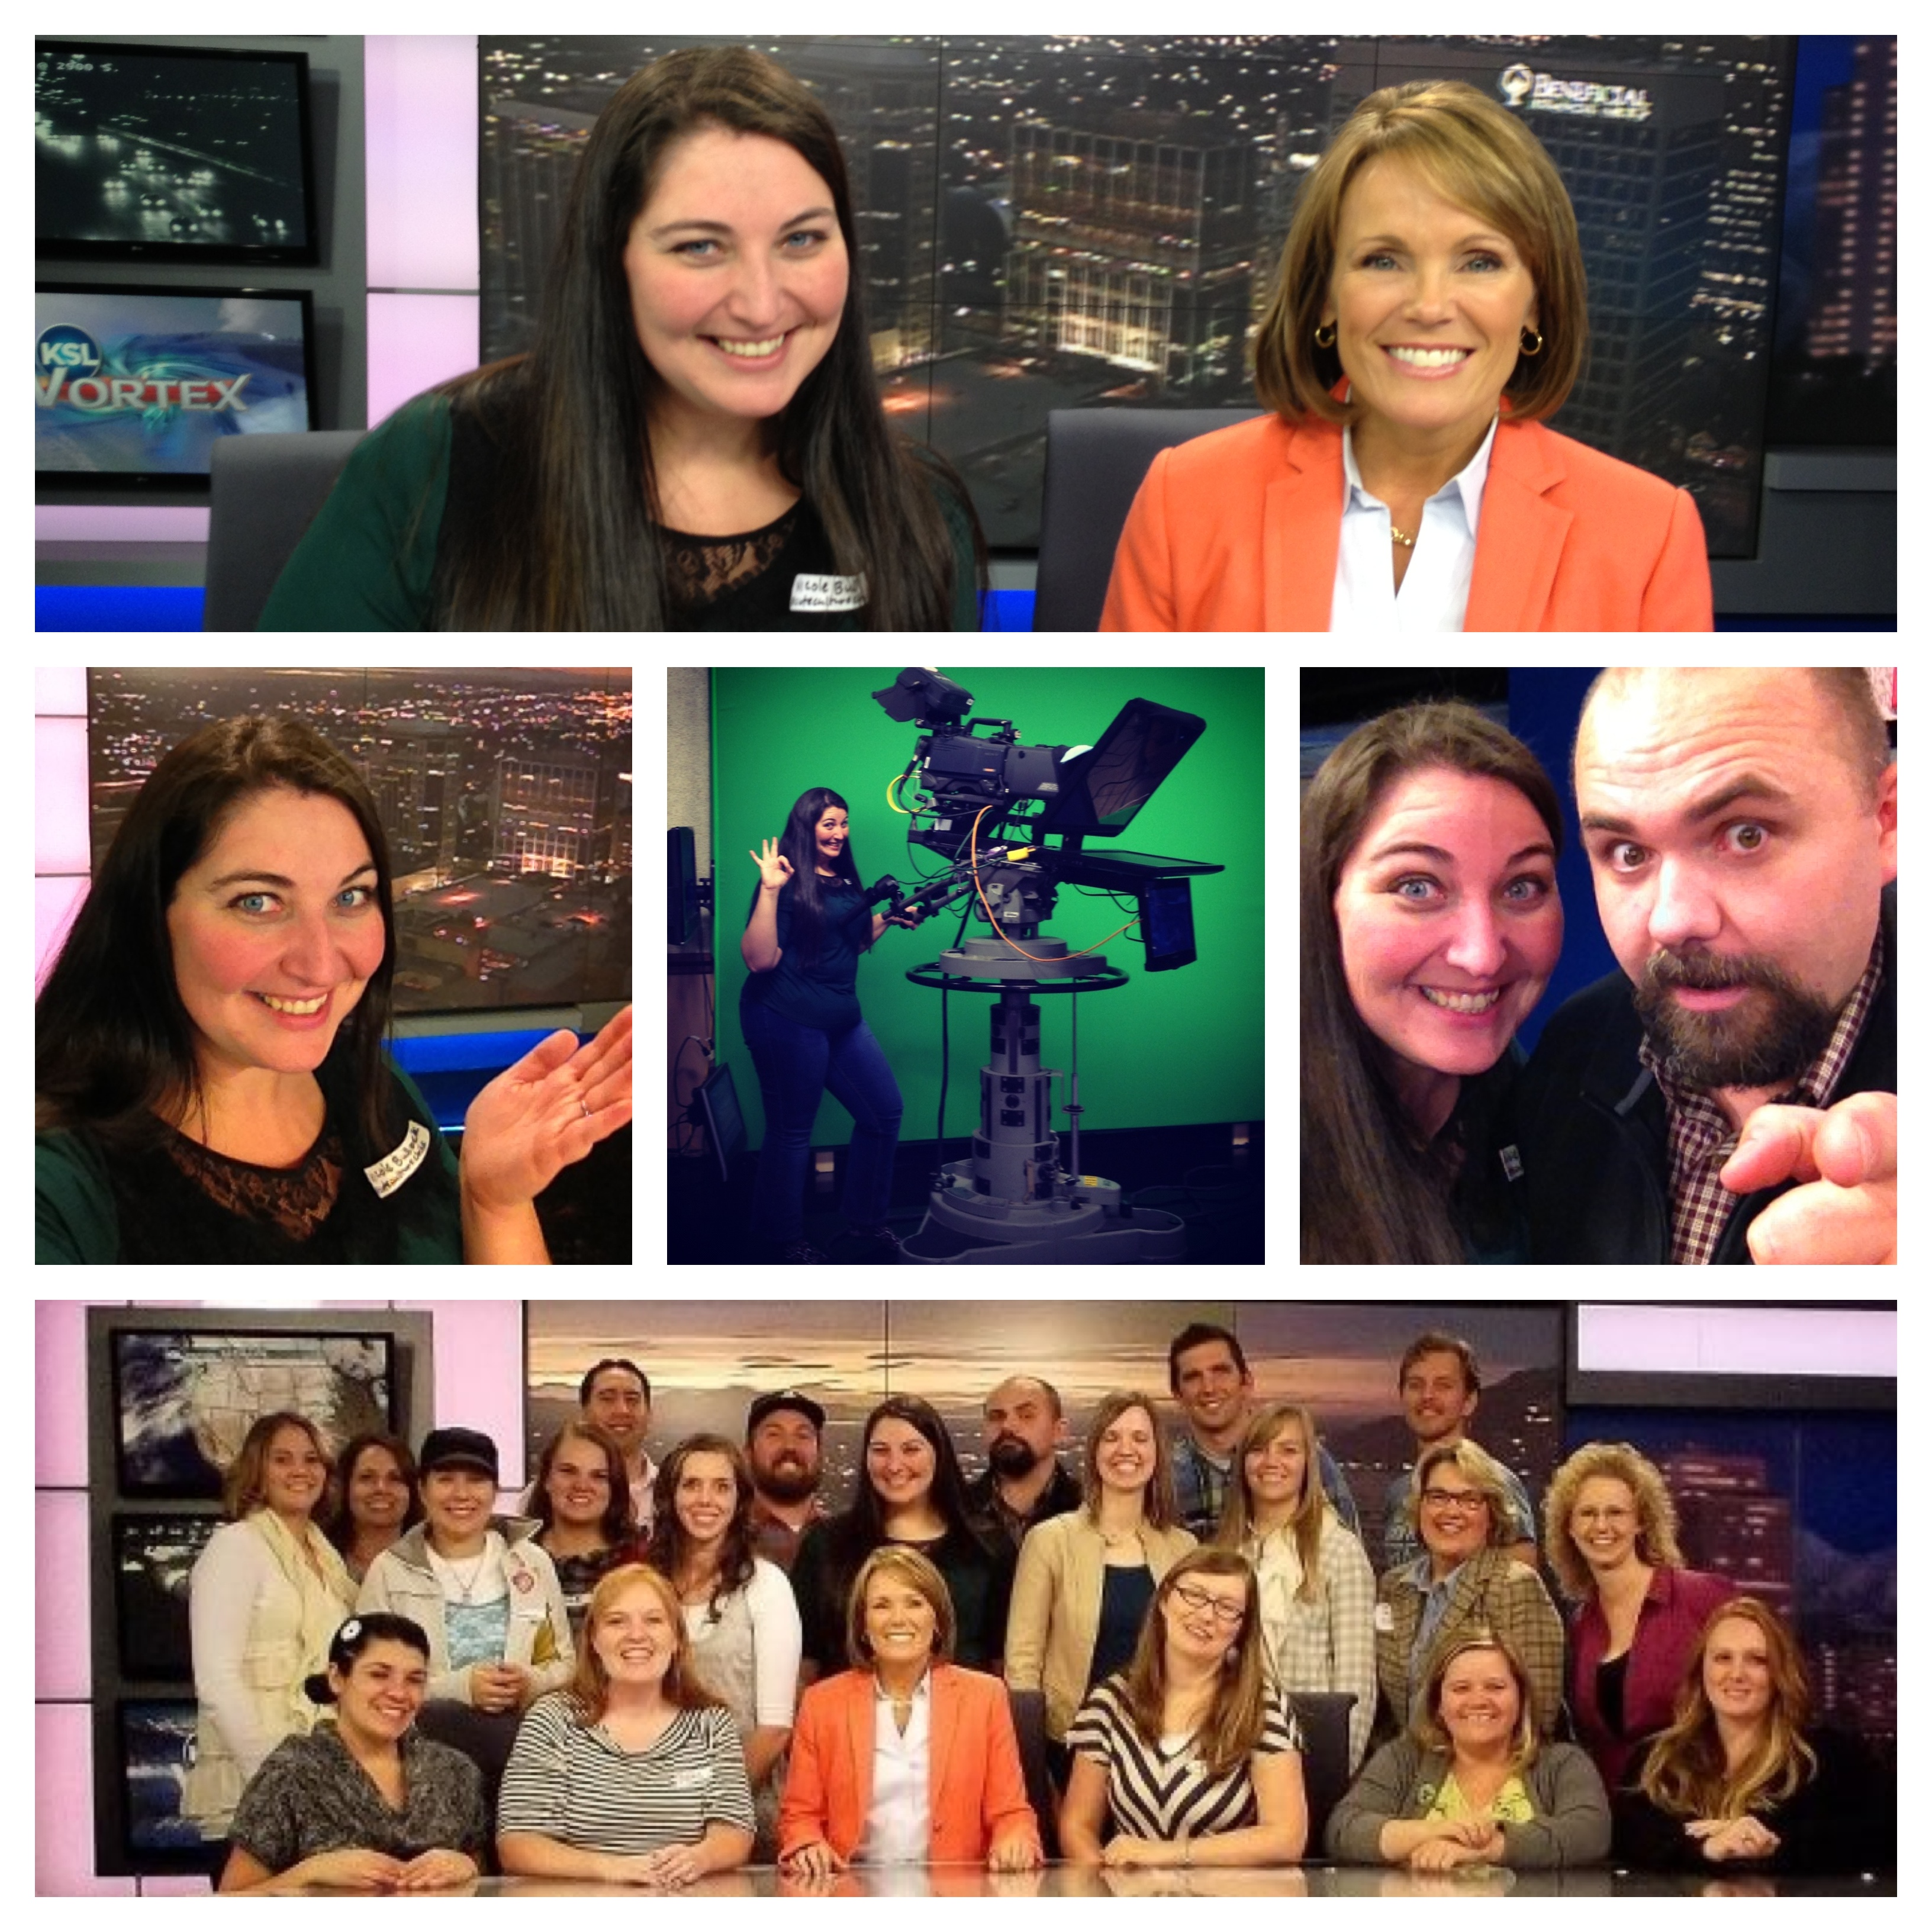 KSL Instameet with Utah Bloggers